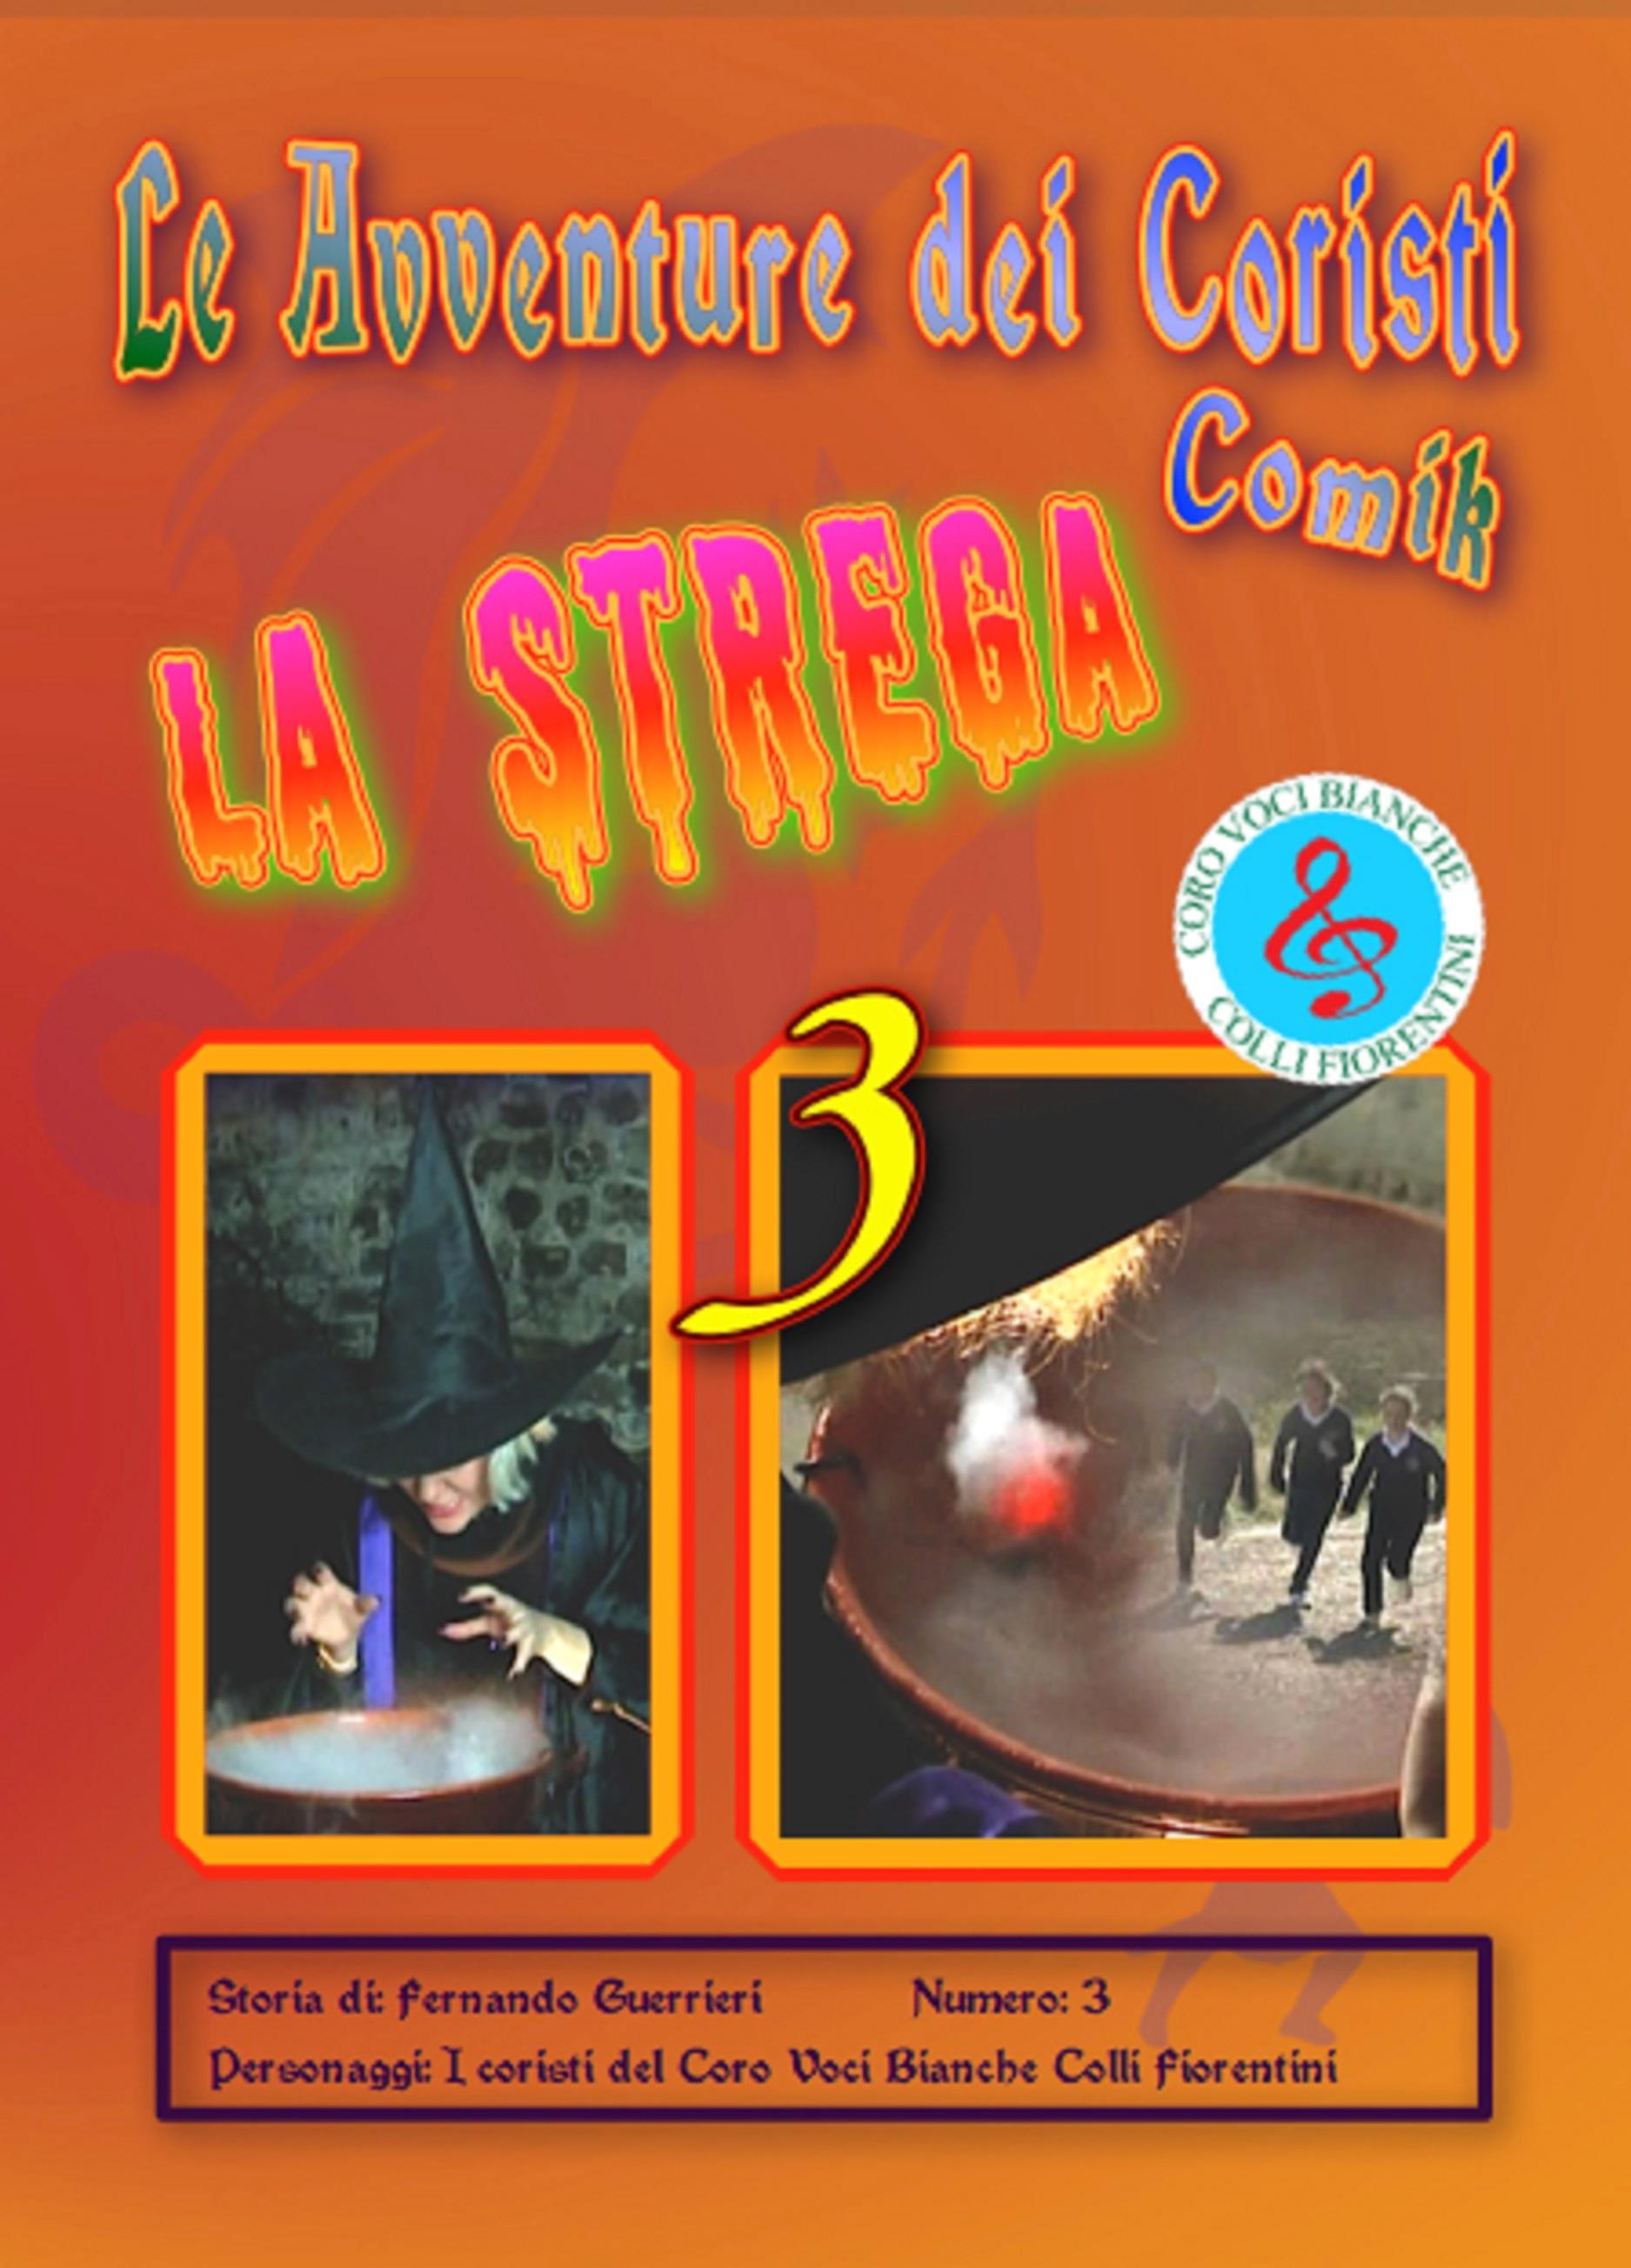 Le avventure dei coristi 3 - La strega